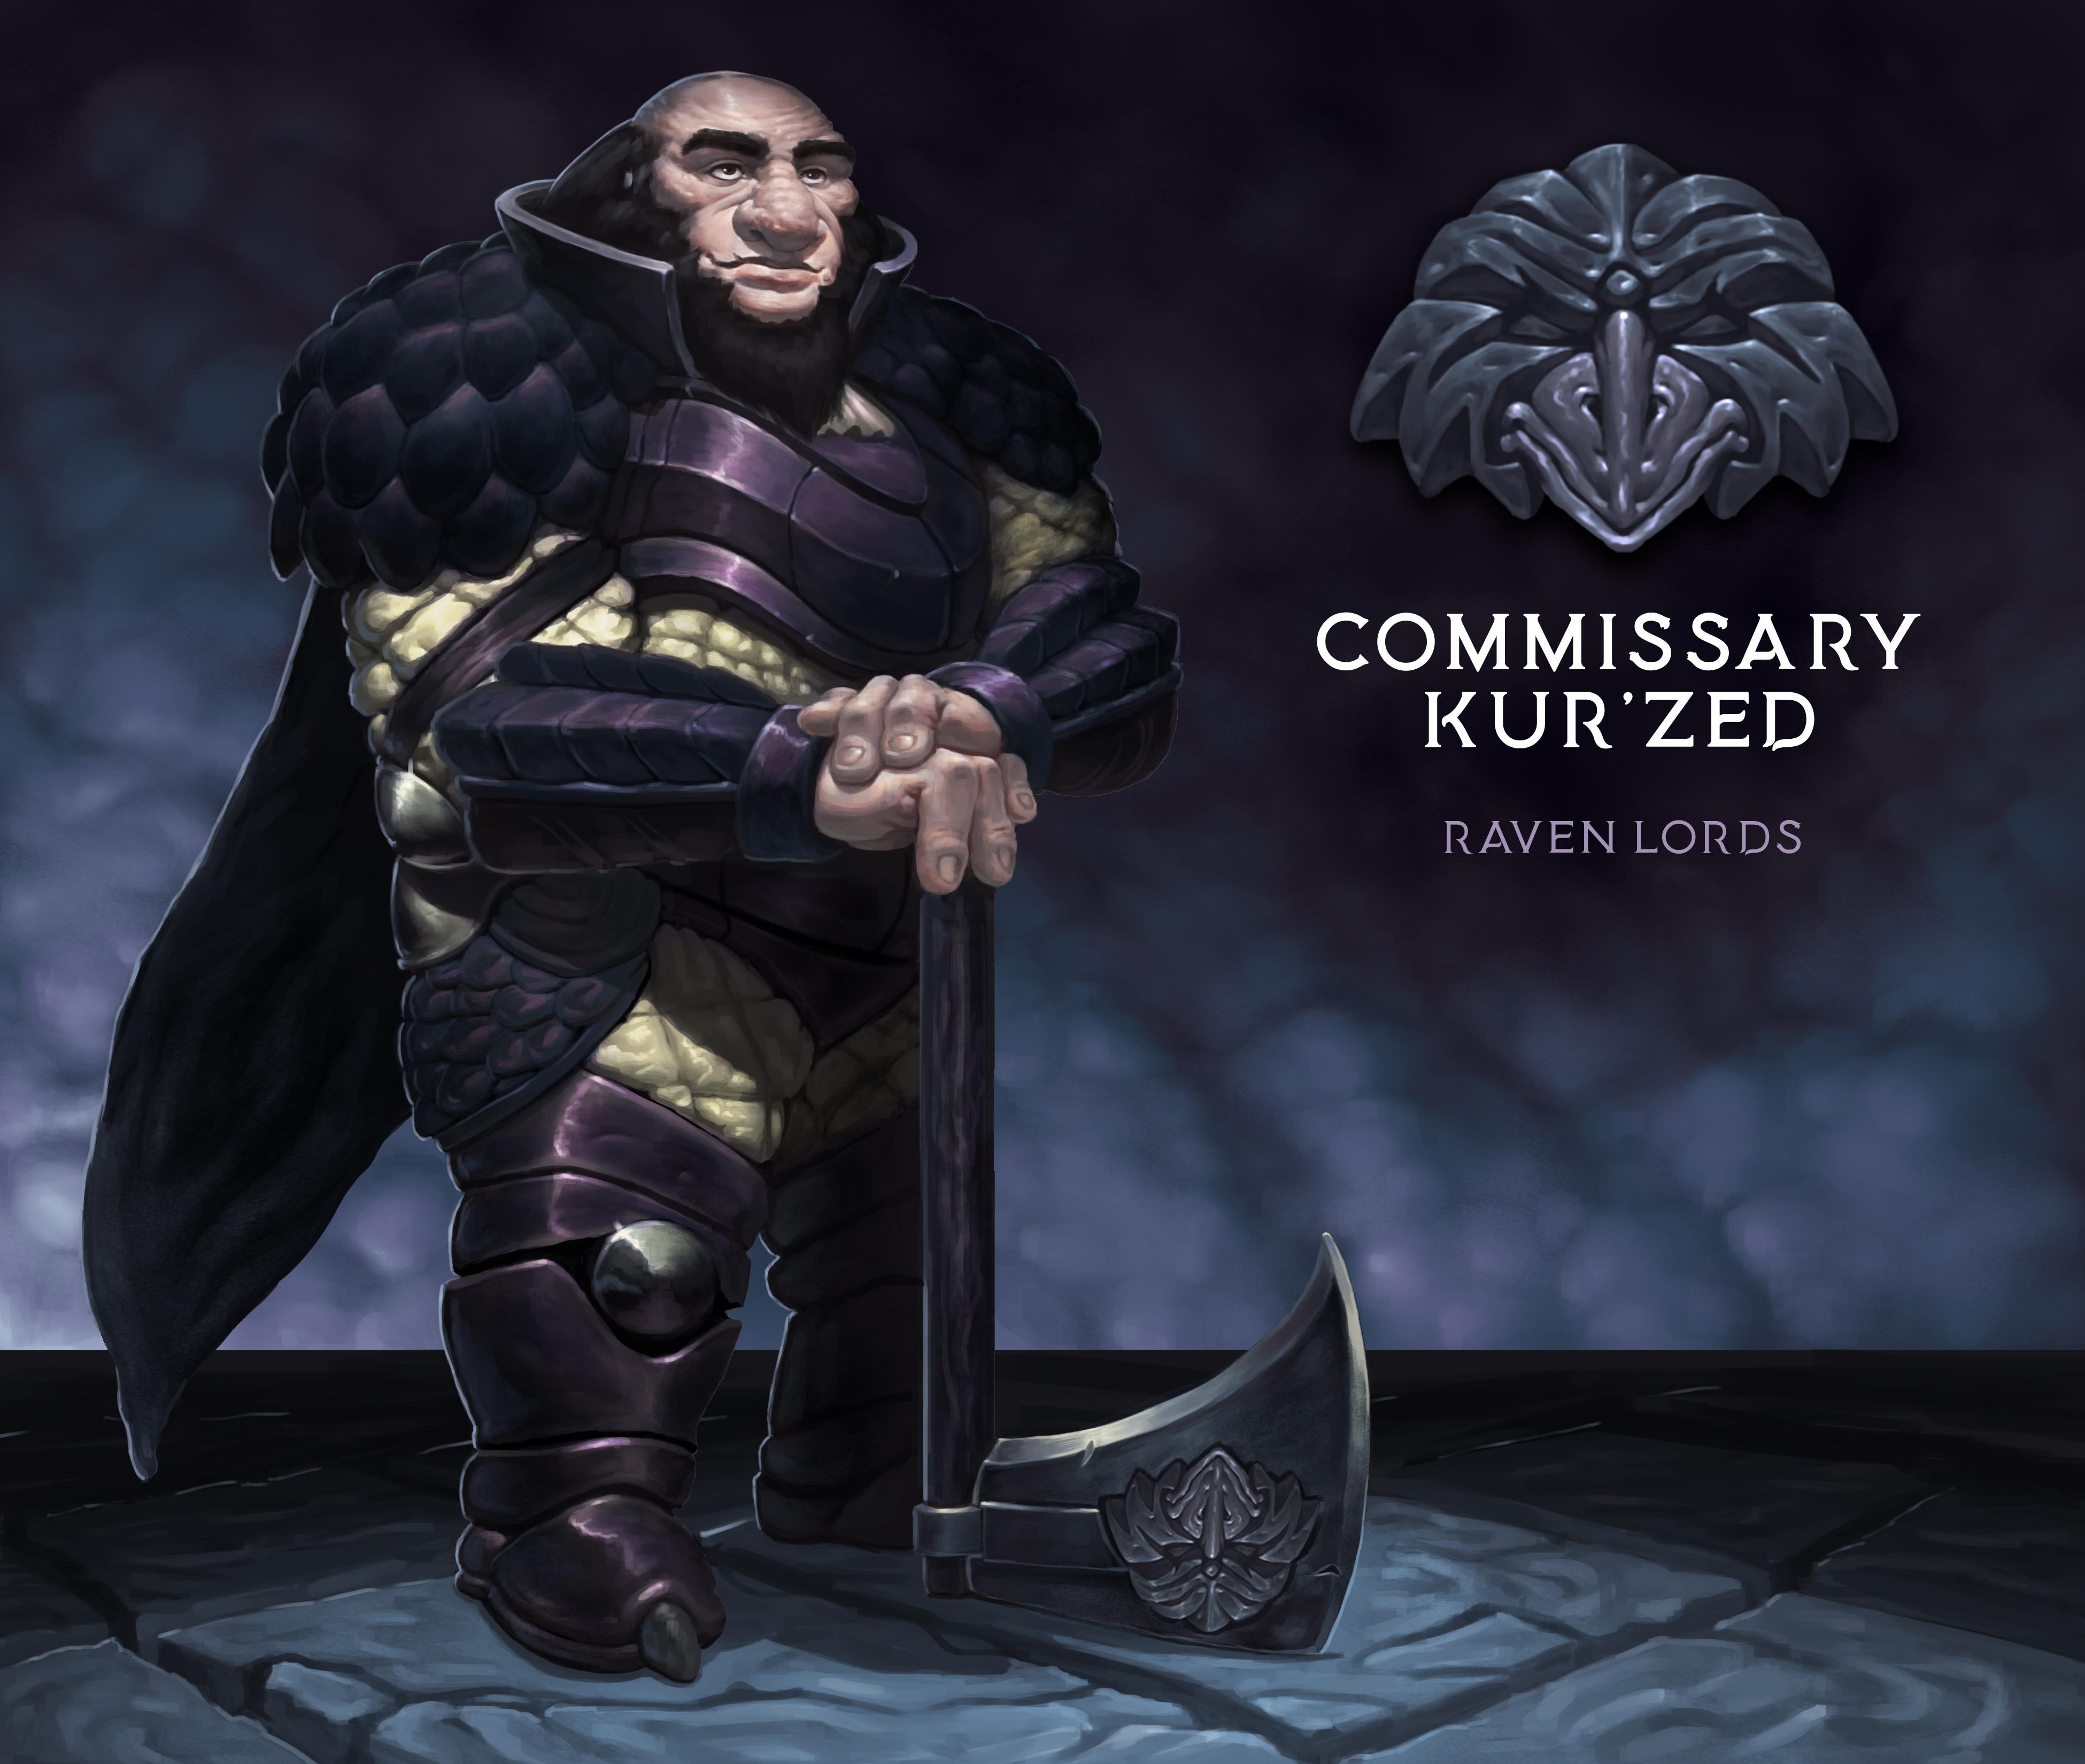 Dwarf-Raven-production